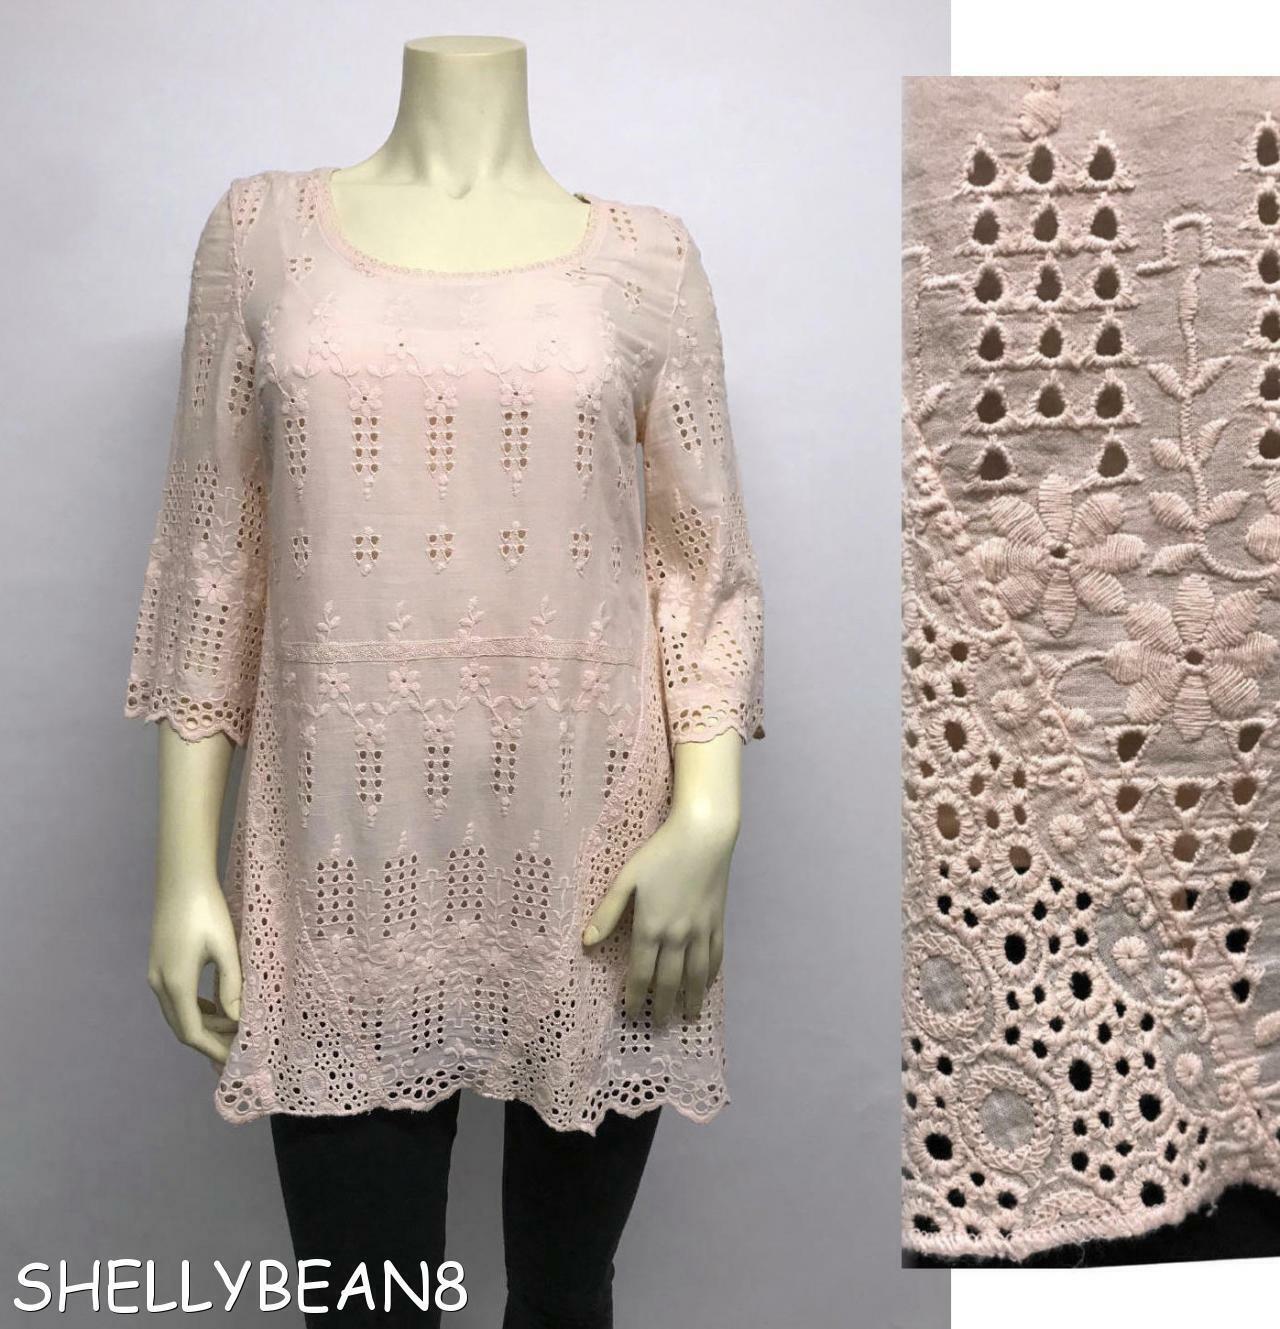 SUNDANCE CATALOG Embroiderot Cotton EYELET TUNIC Blouse Top & Slip HANKY HEM XS